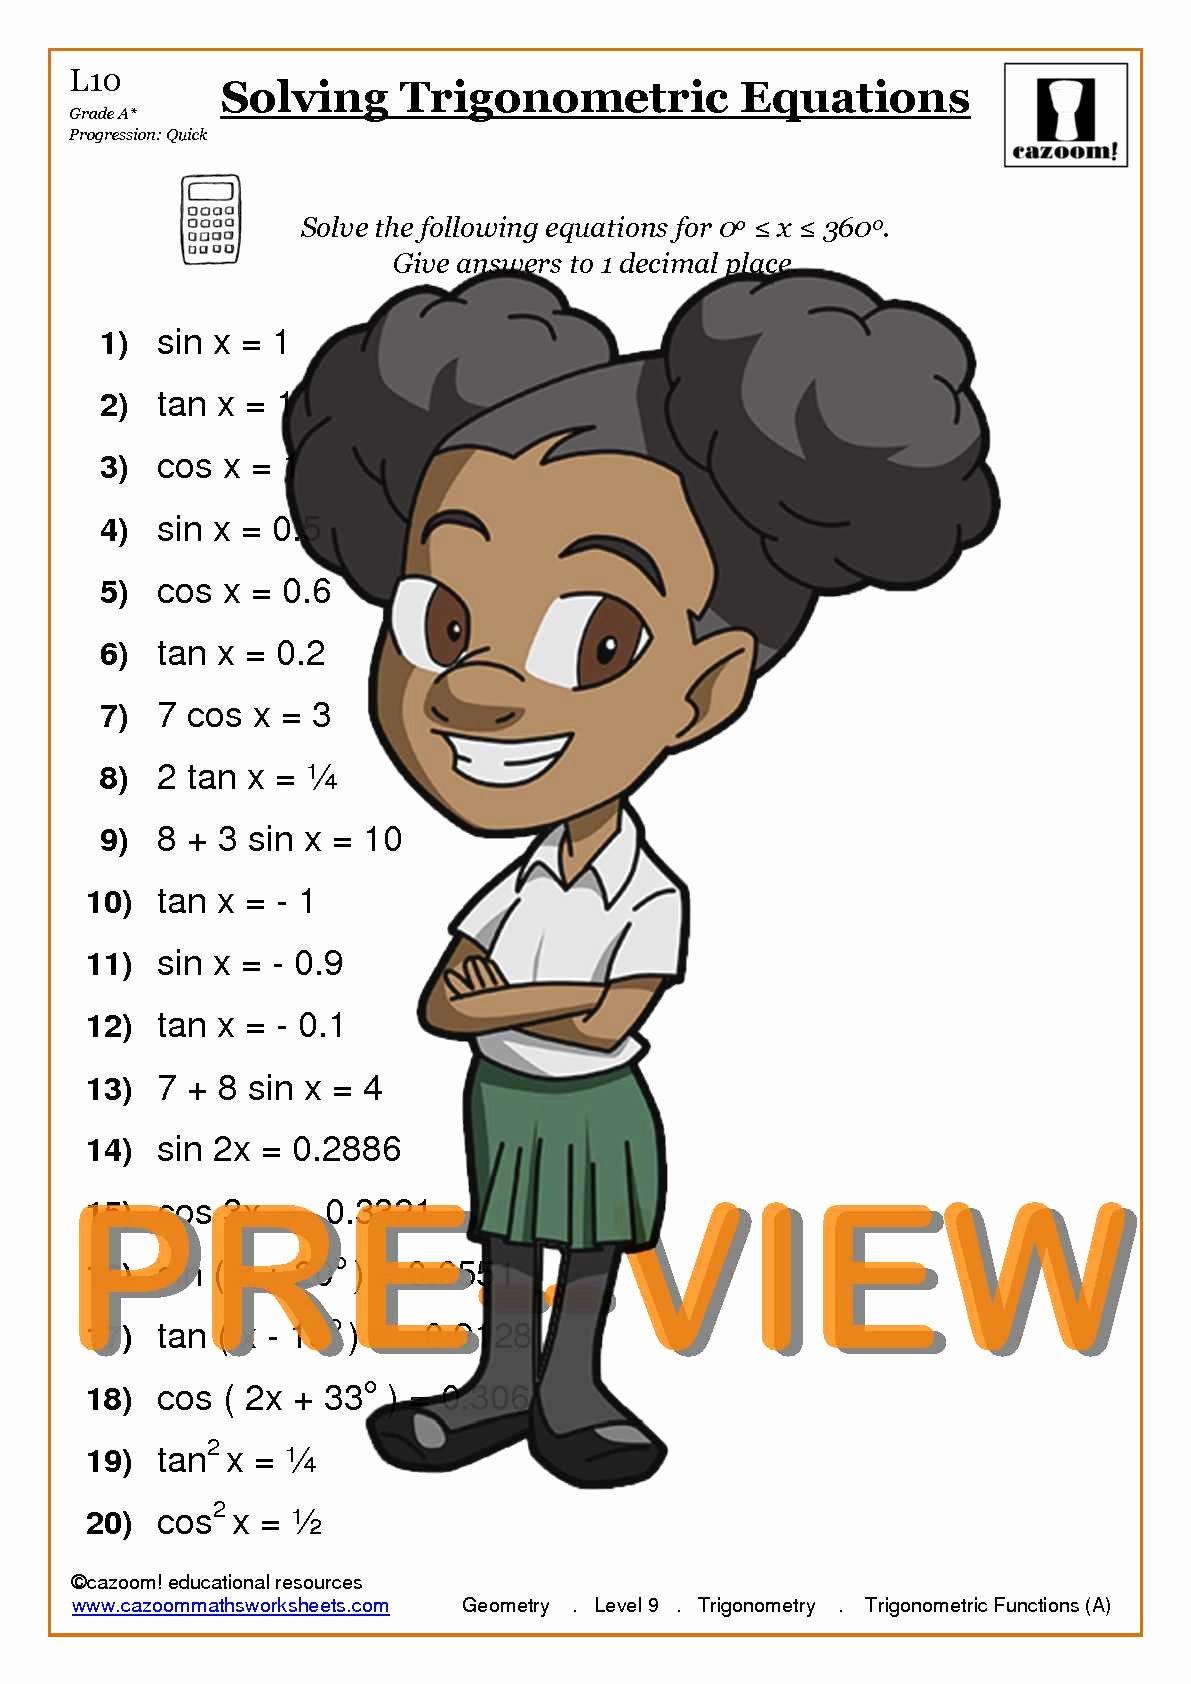 Solving Trigonometric Equations Worksheet Answers Inspirational Trigonometry Worksheets with Answers